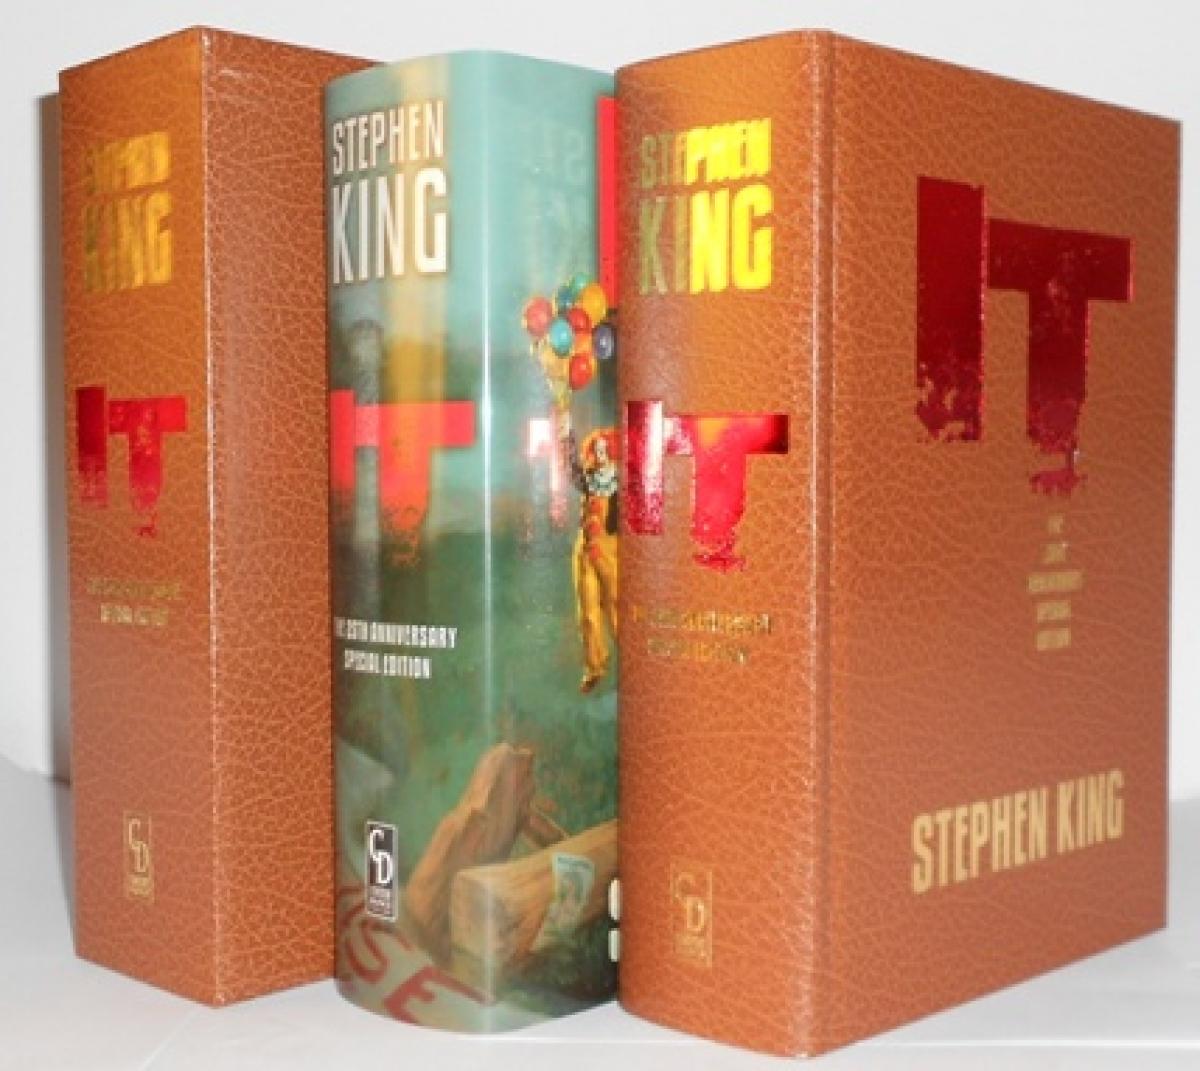 IT 25th Anniversary Edition (Cemetery Dance) Gift Edition - książka, etui i obwoluta - obrazek